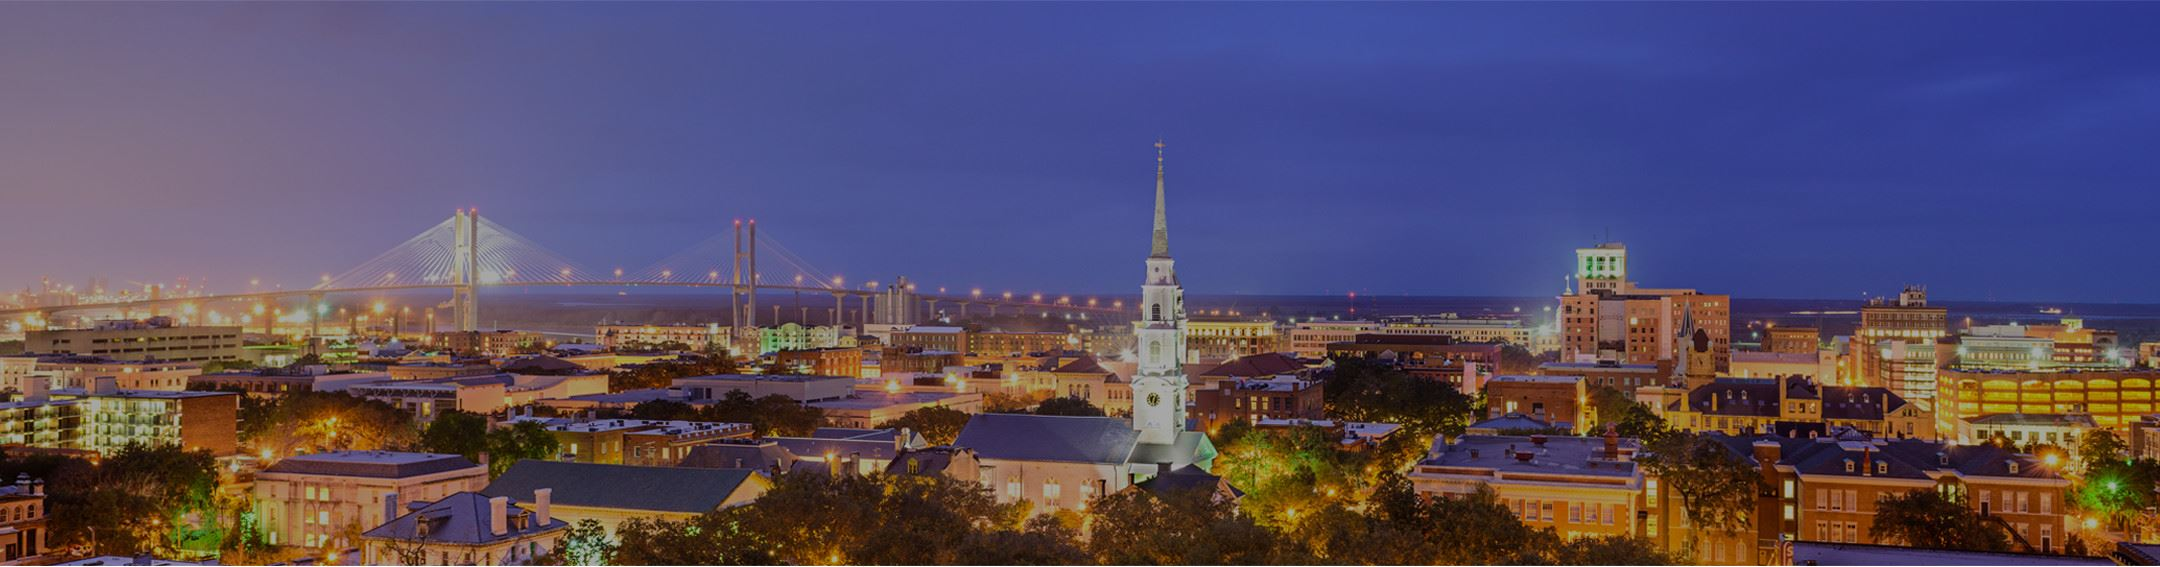 Recorder's Court | Savannah, GA - Official Website